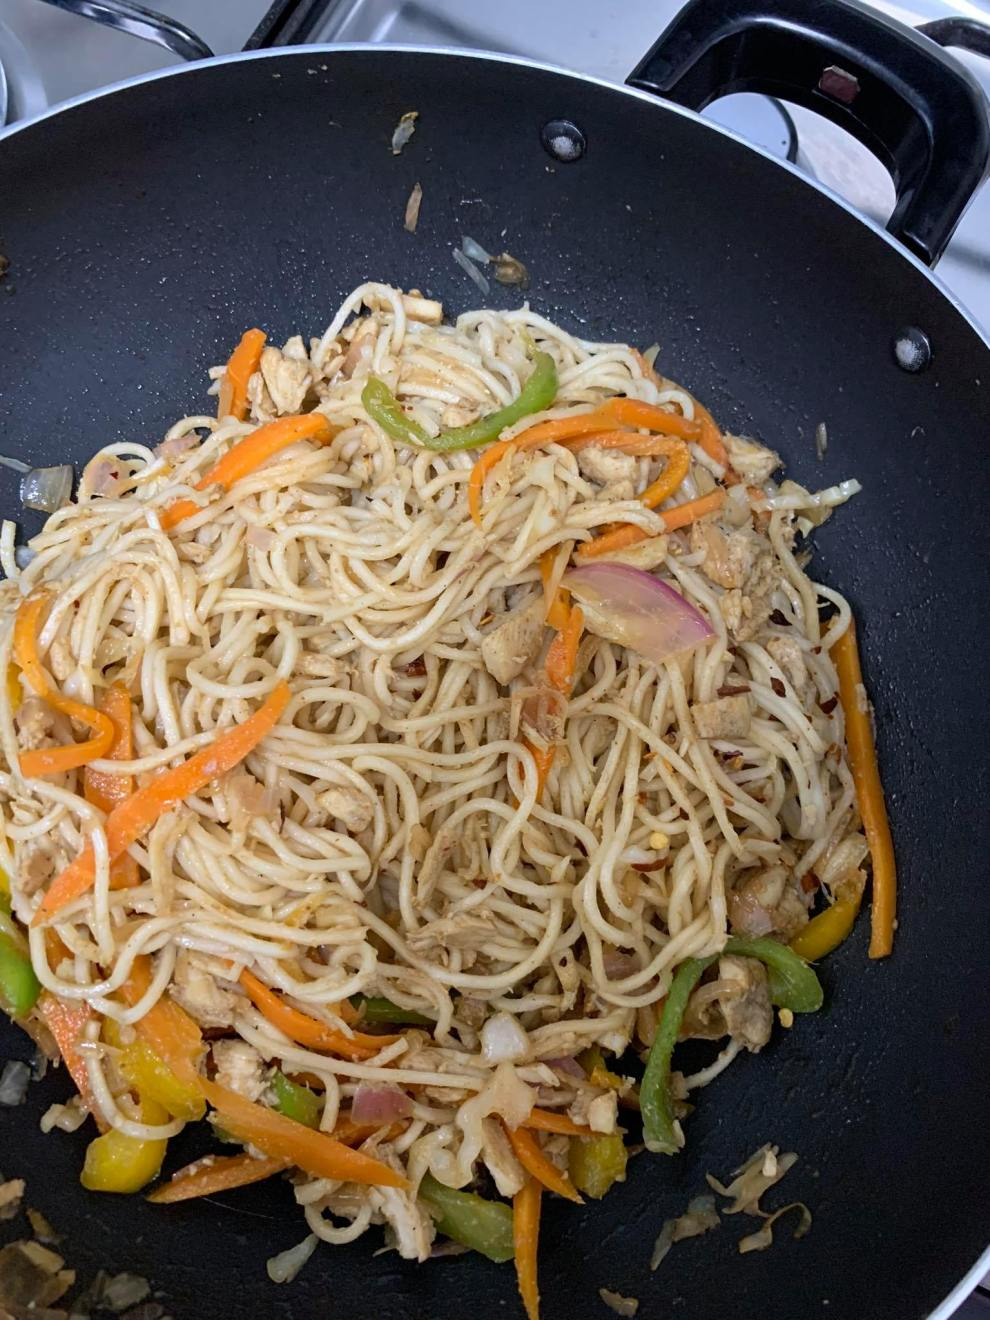 Hakka Noodles in Wok